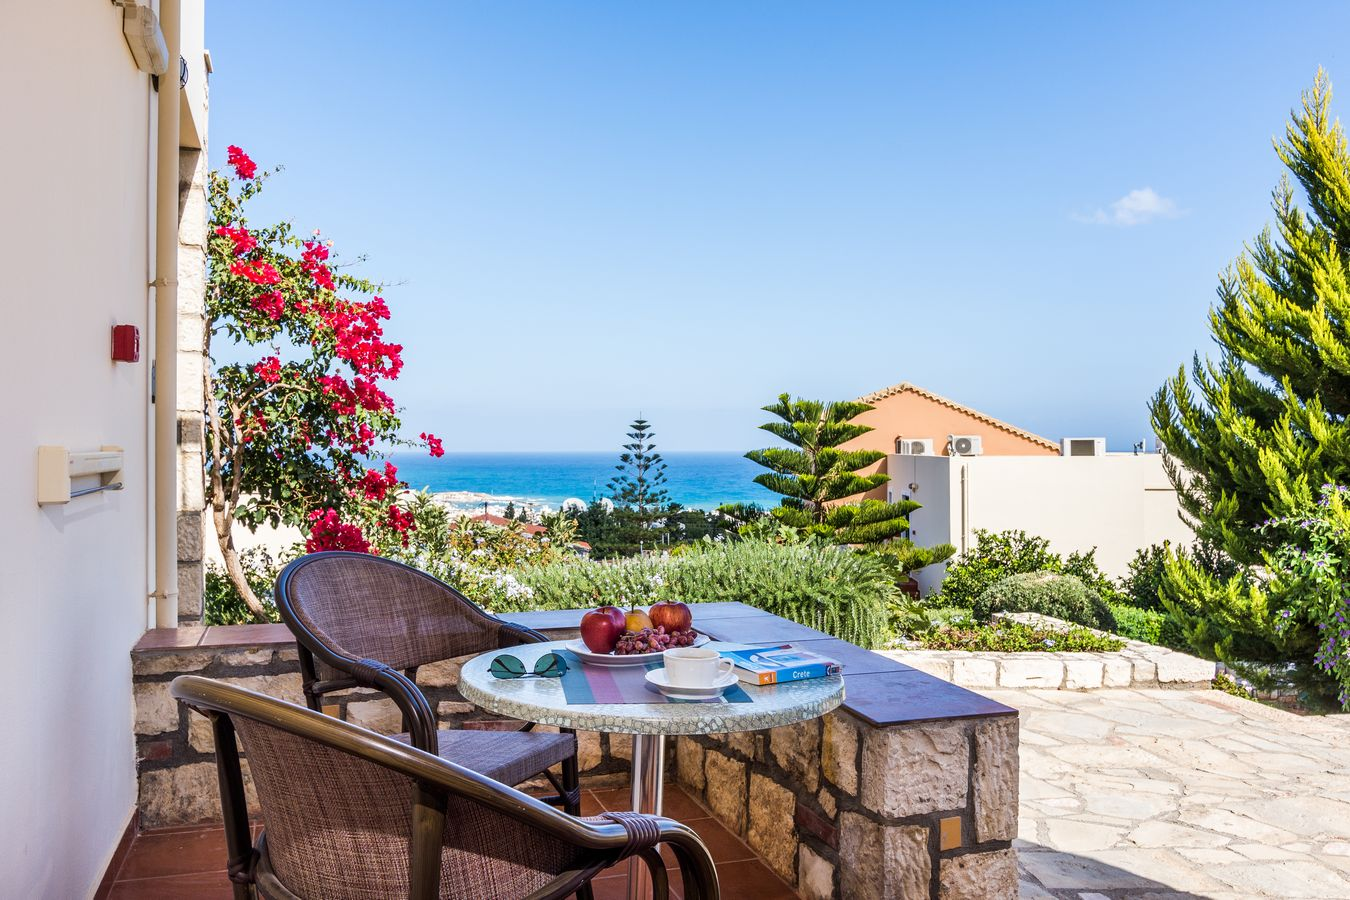 Deluxe suite Sea view Balcony - Pilots Villas Hersonissos Crete